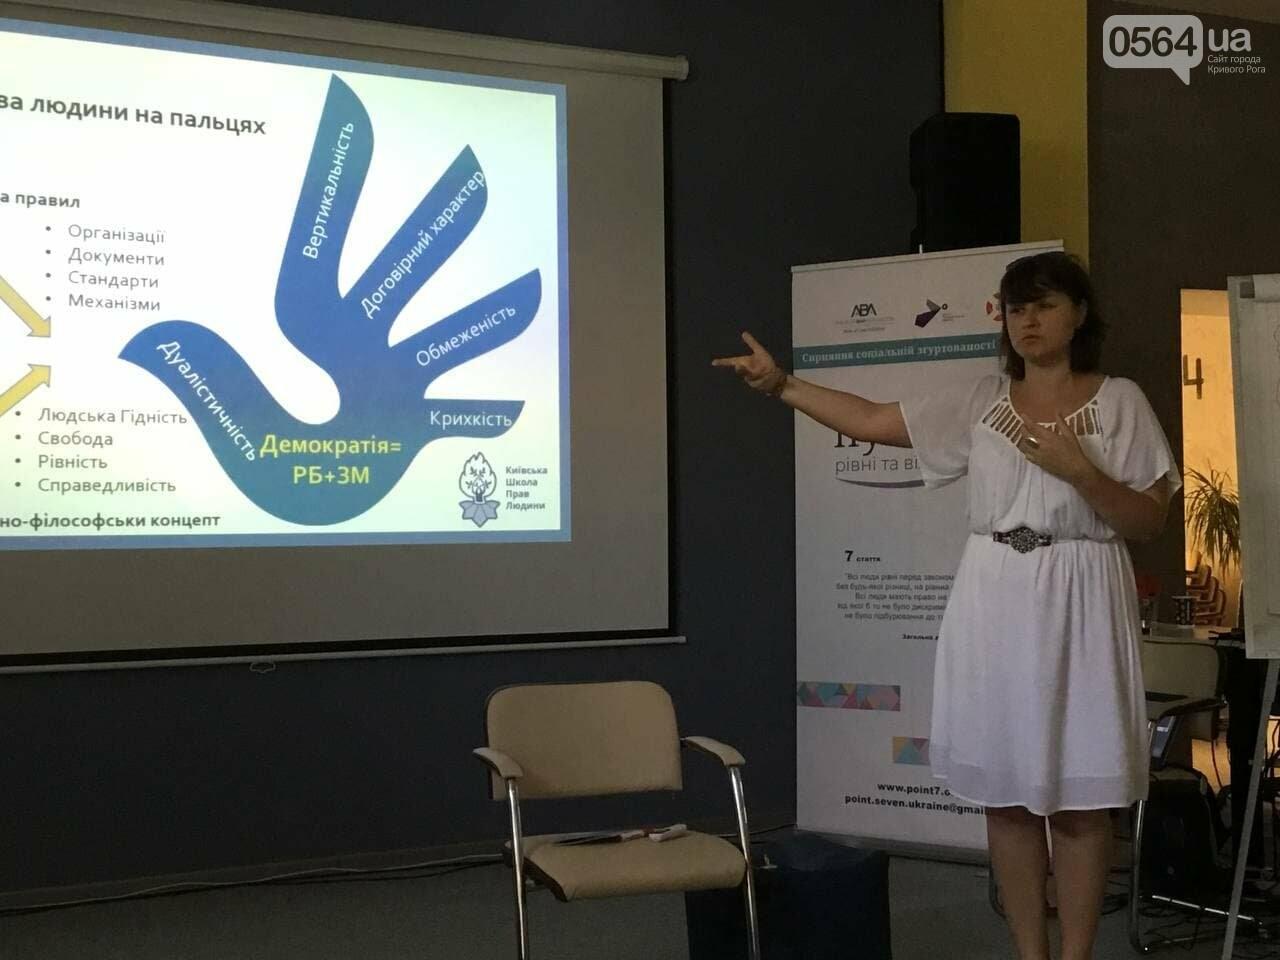 Криворожанам прочитали лекции о гендерном (не) равенстве и правах человека, - ФОТО, ВИДЕО, фото-2